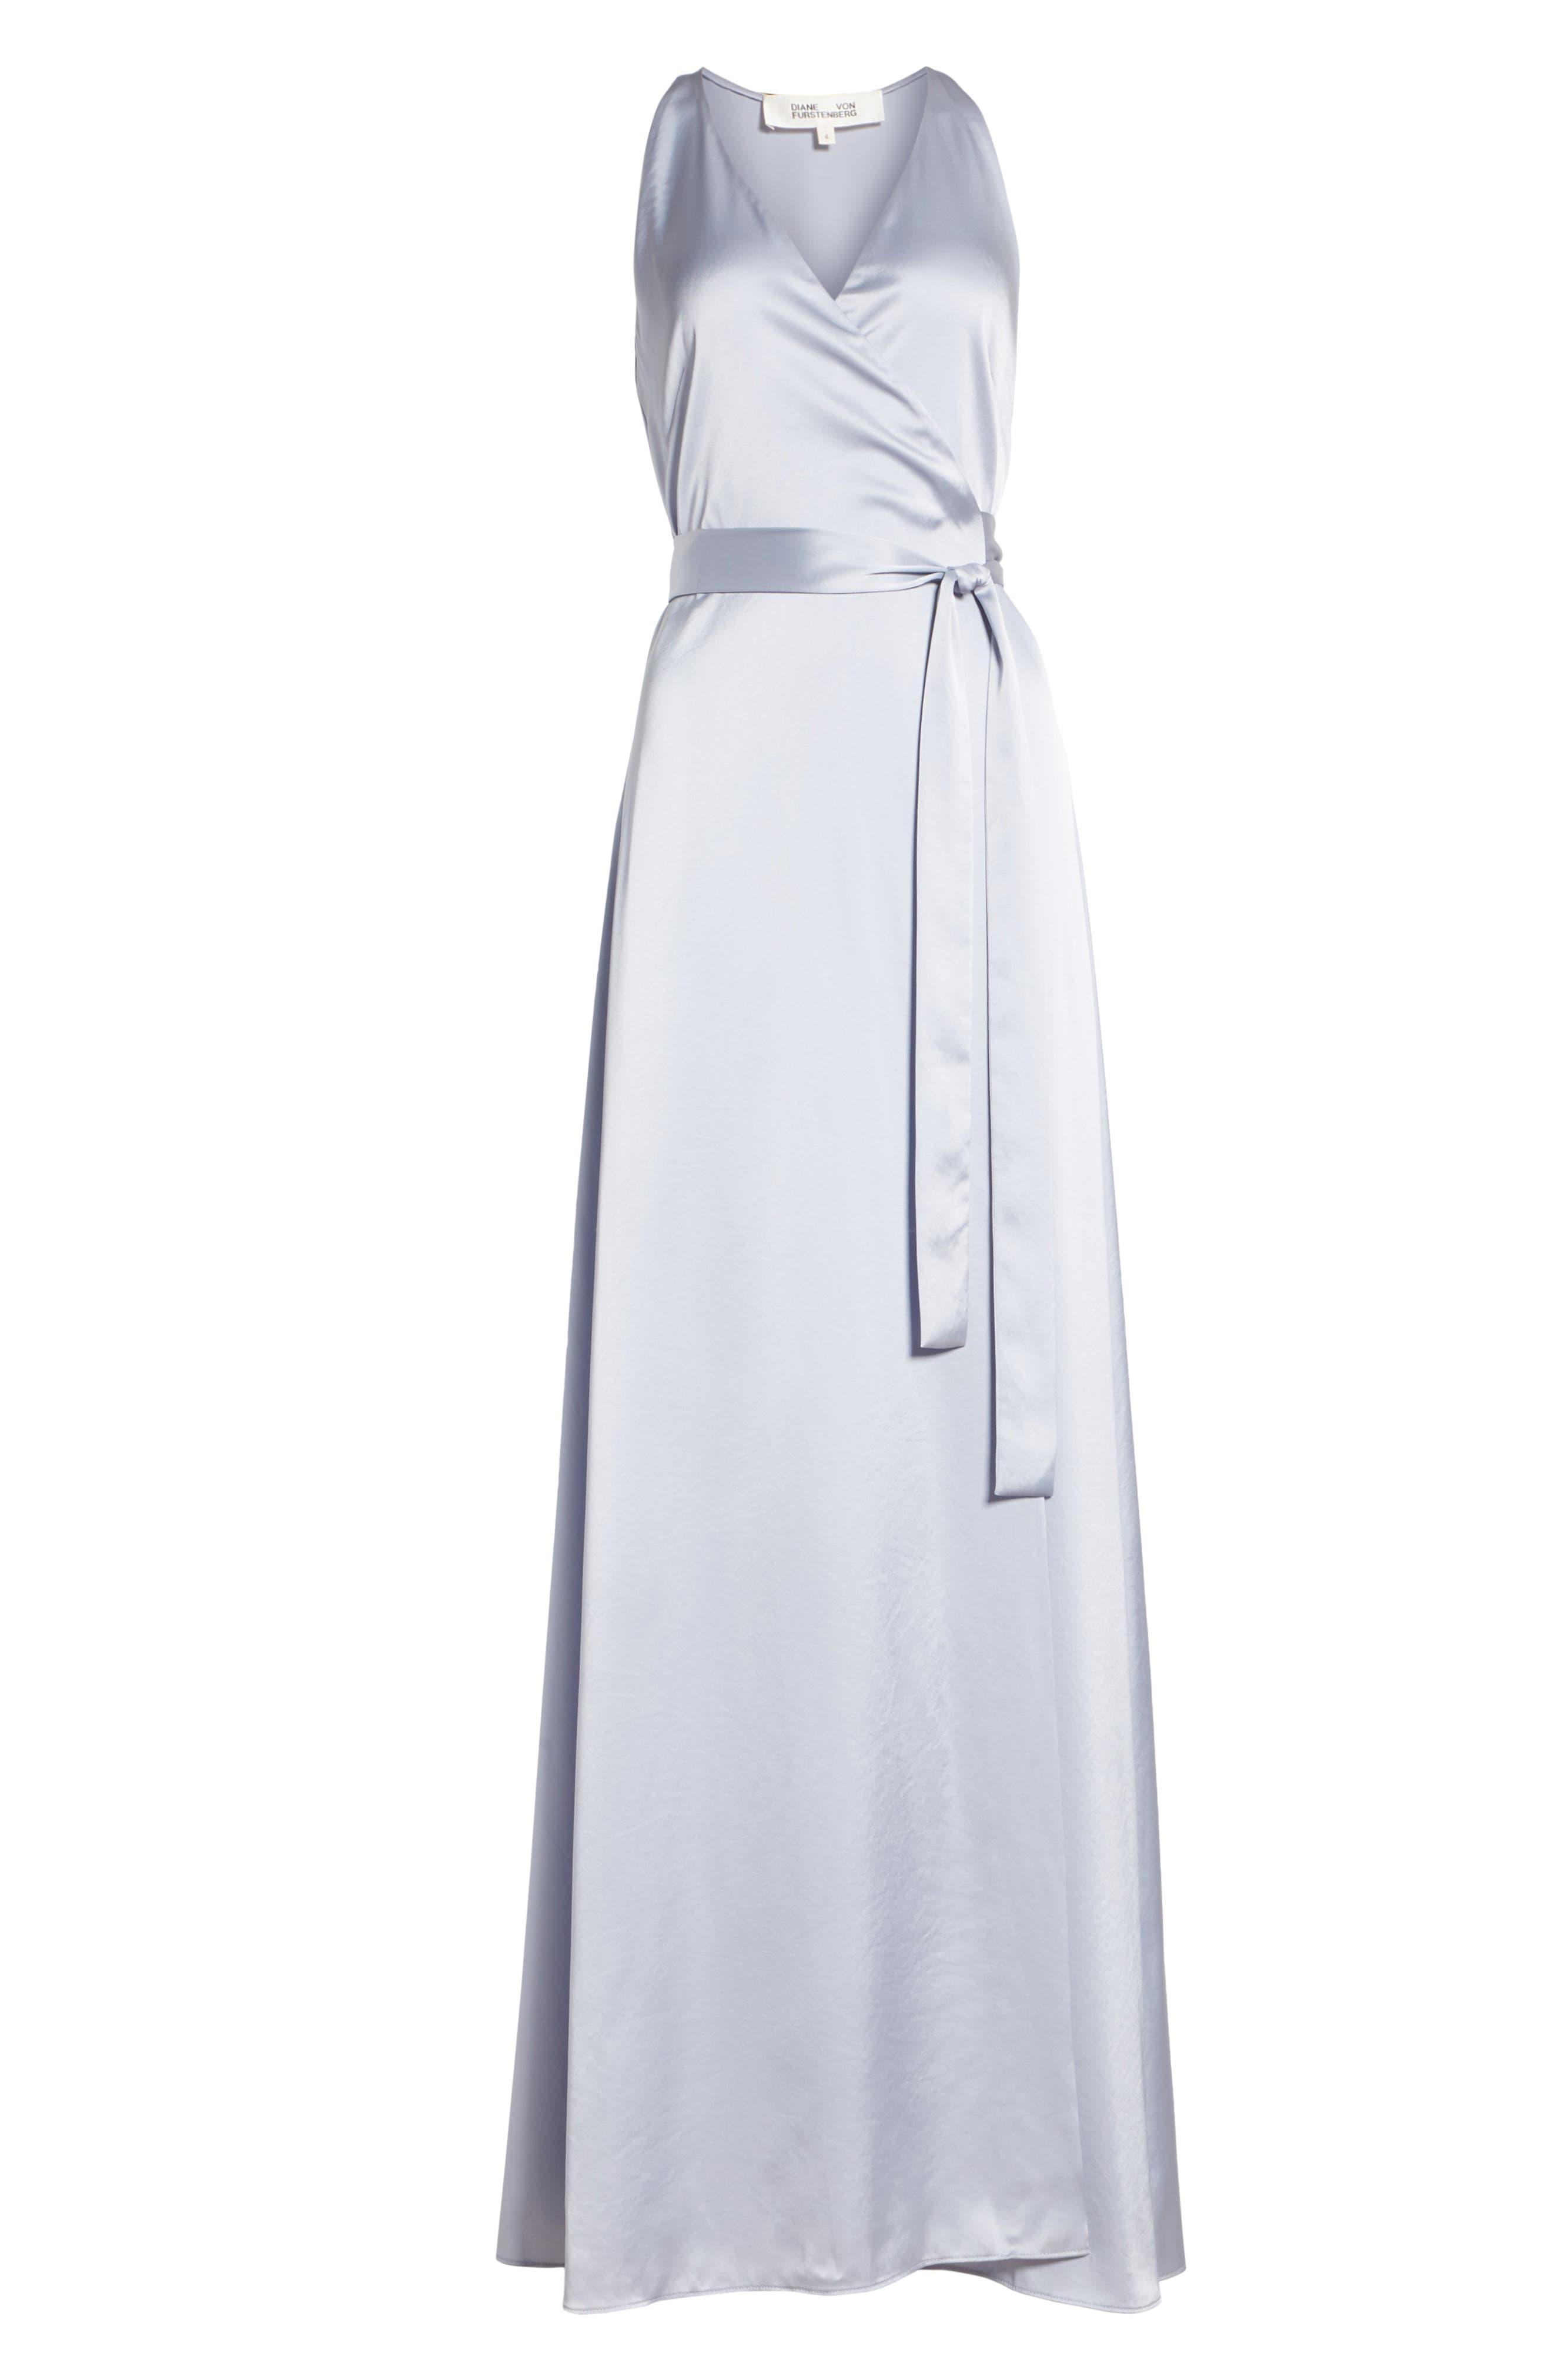 Diane von Furstenberg Wrap Gown,                             Alternate thumbnail 6, color,                             031